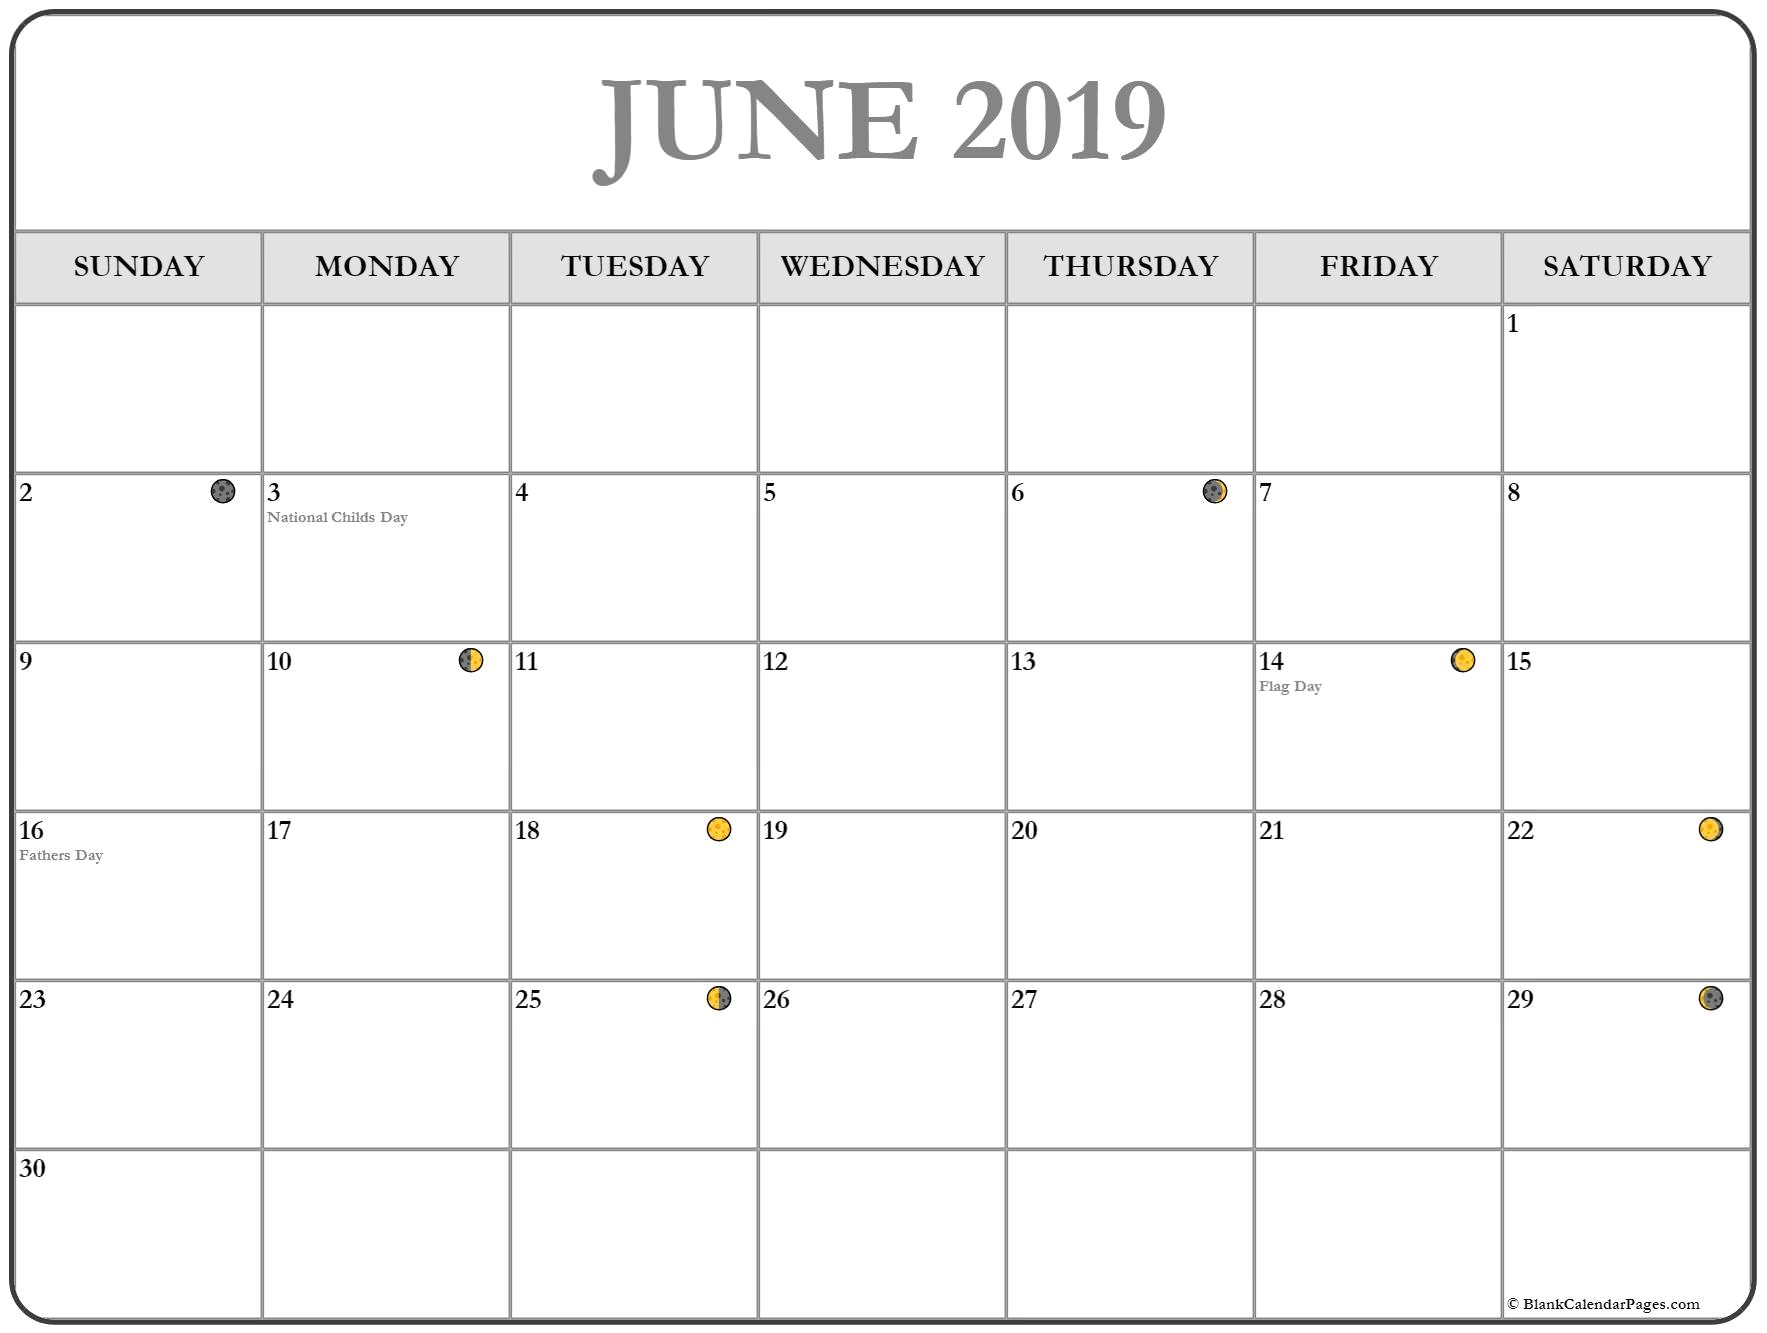 Moon Phases June 2019 Calendar Printable – Free Printable Calendar Calendar 2019 With Moon Phases